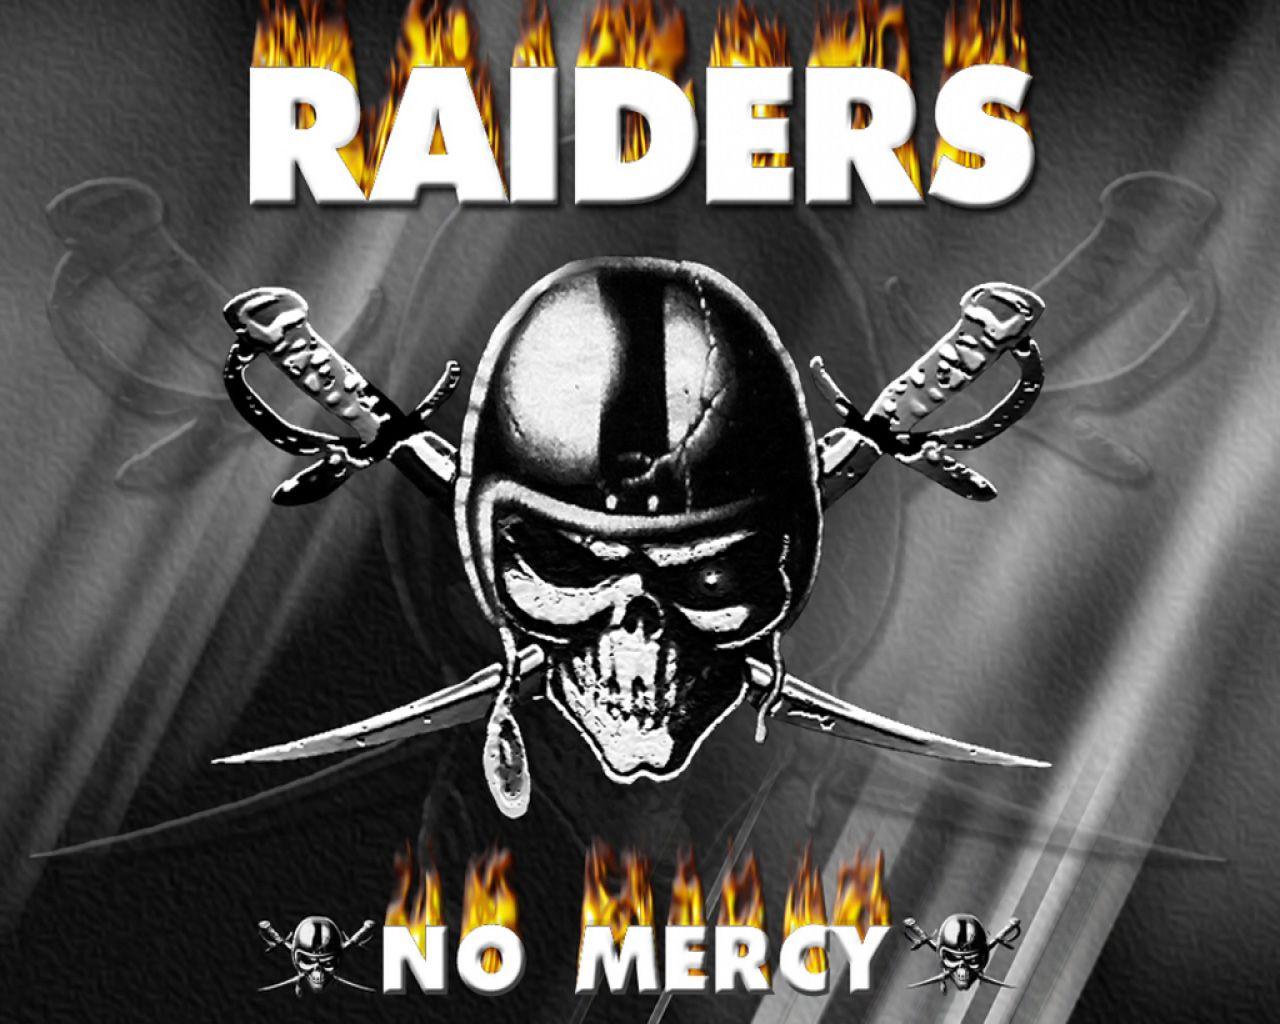 Pin by Hector Torres on radiers Raiders wallpaper Nfl raiders 1280x1024